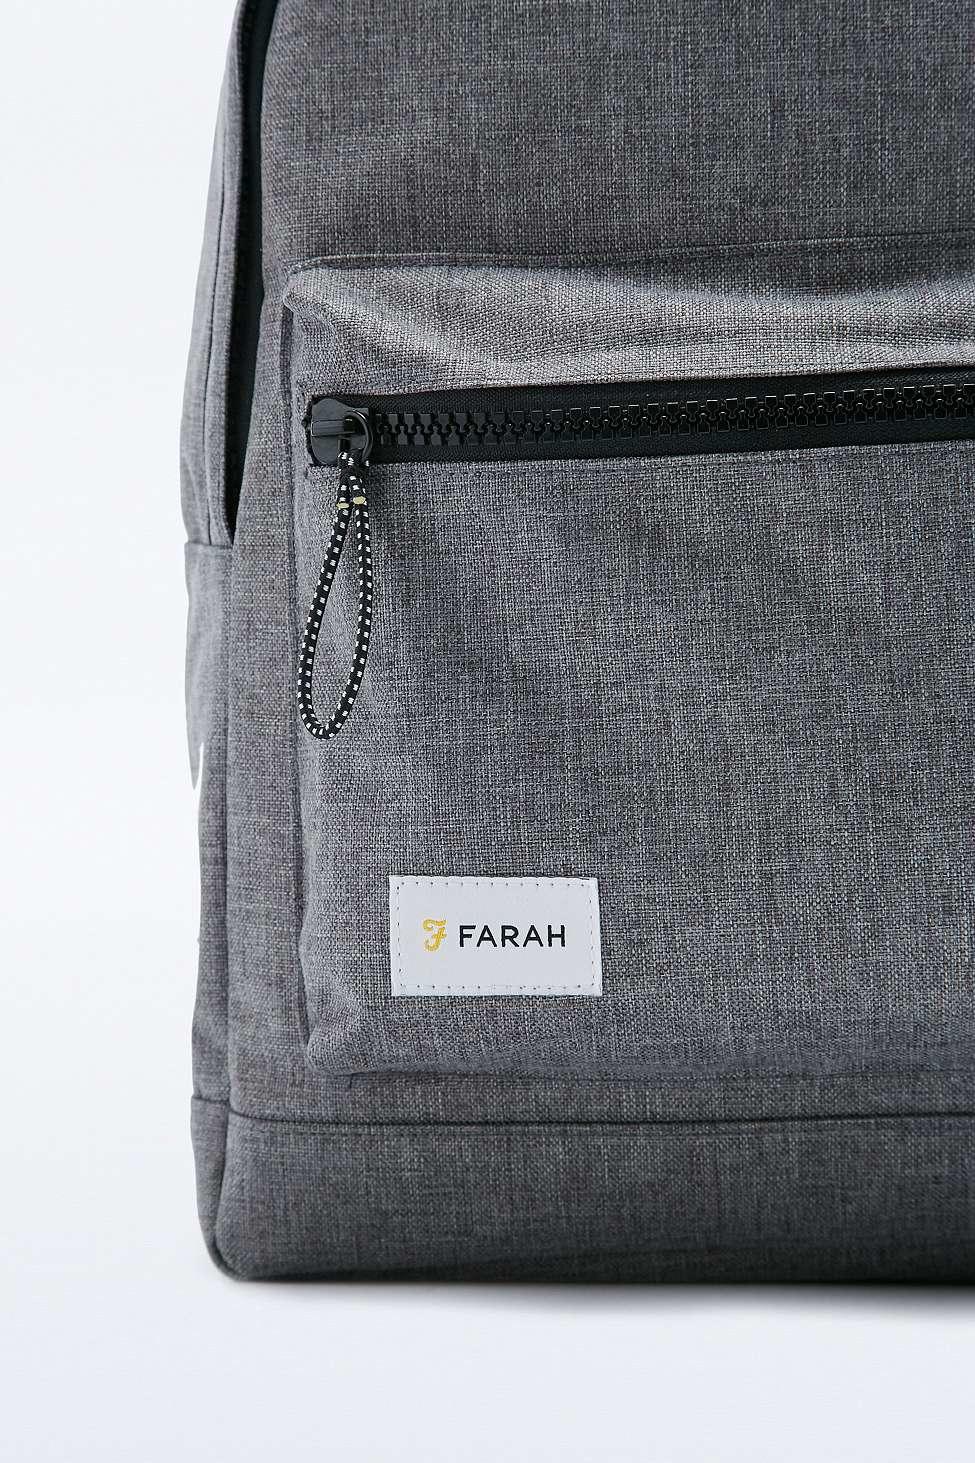 Farah Corwin Marl Backpack in Gray for Men